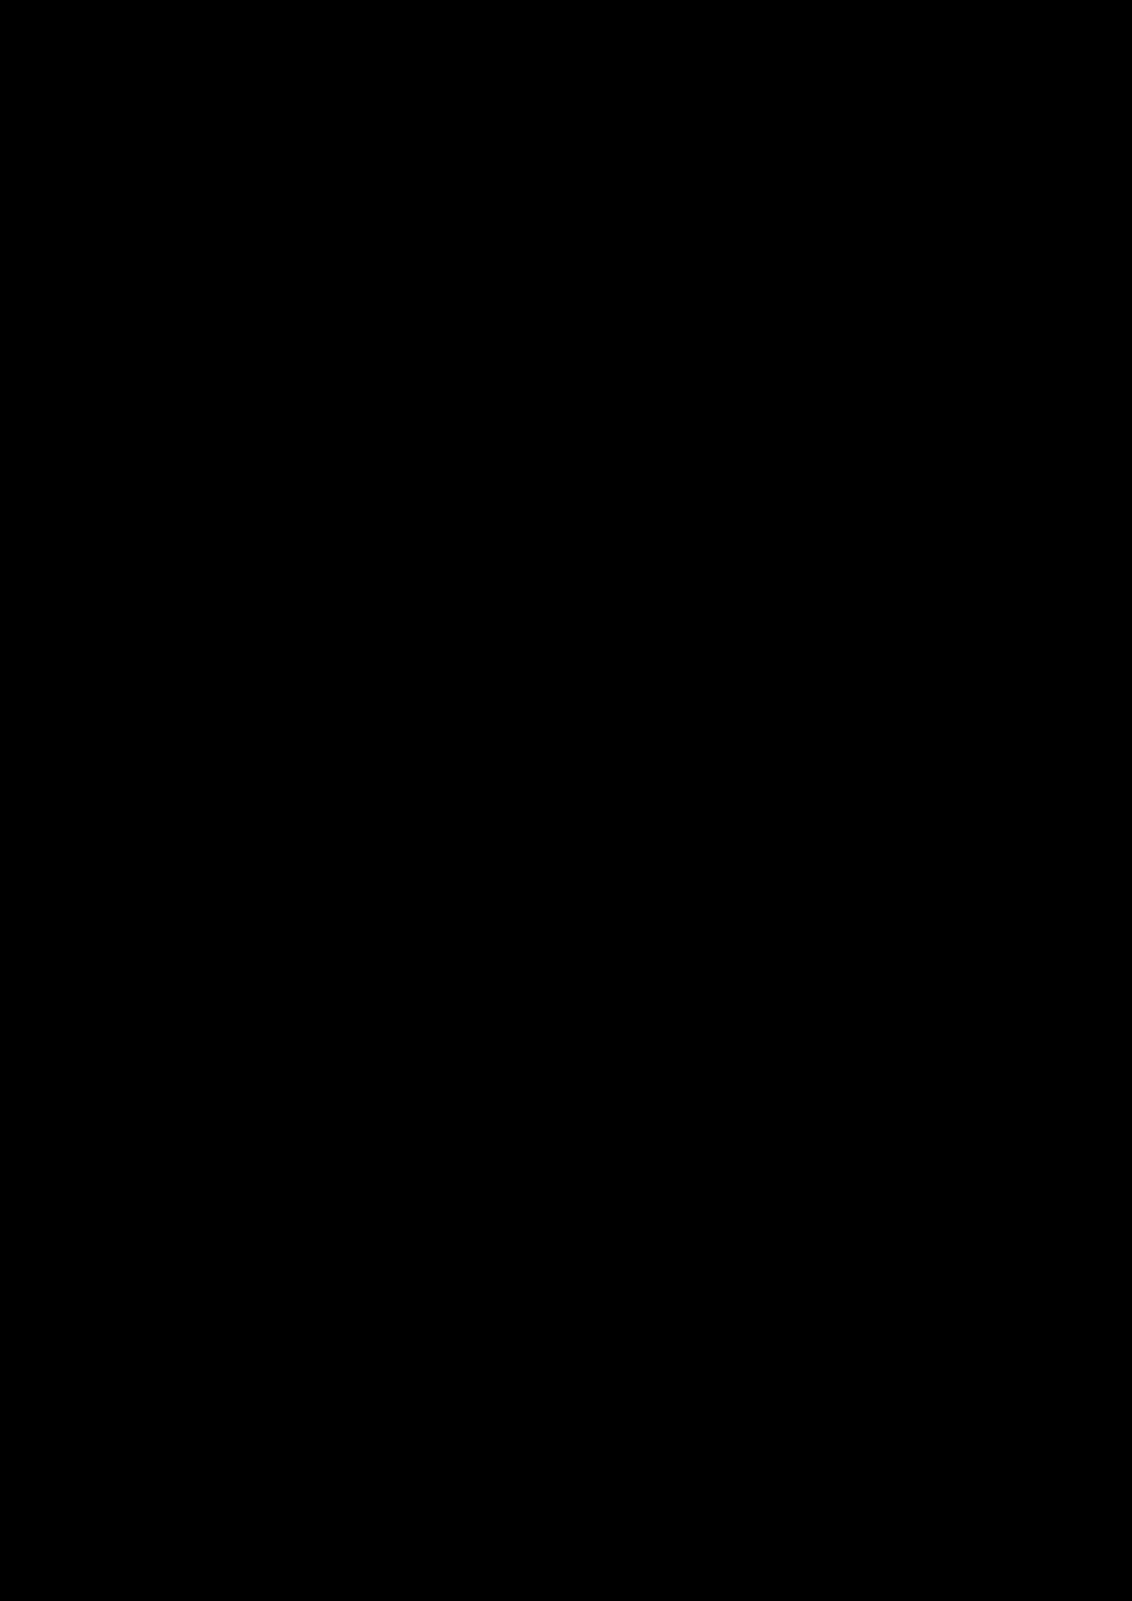 Korolevstvo slez slide, Image 36